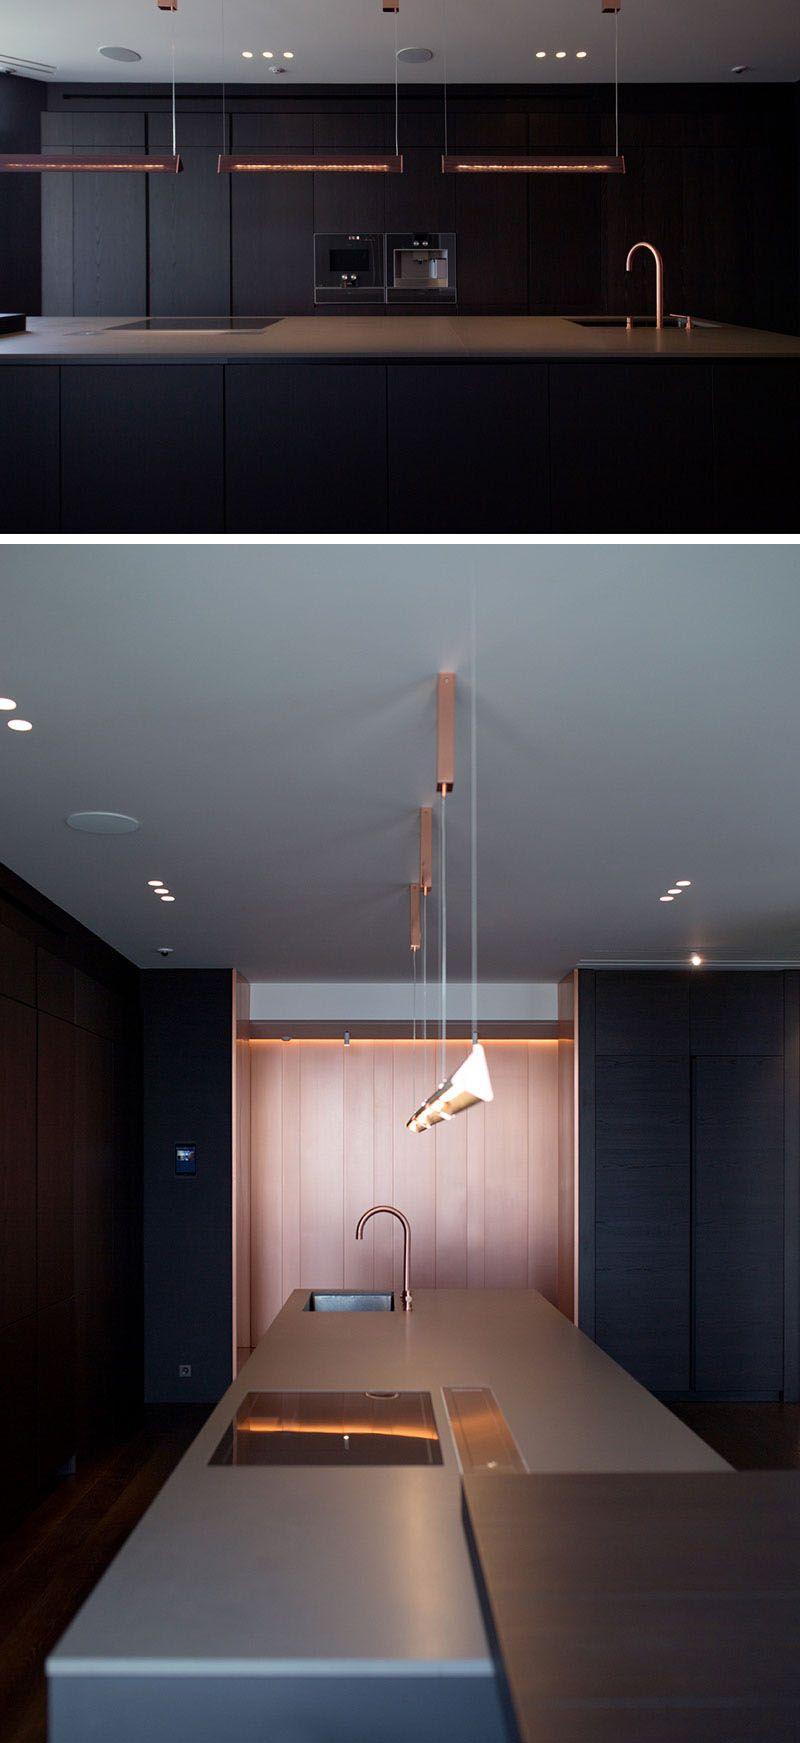 Black Kitchen With Copper Accents 101117 1148 05 Jpg 800 1743 Keukens Keuken Interieur